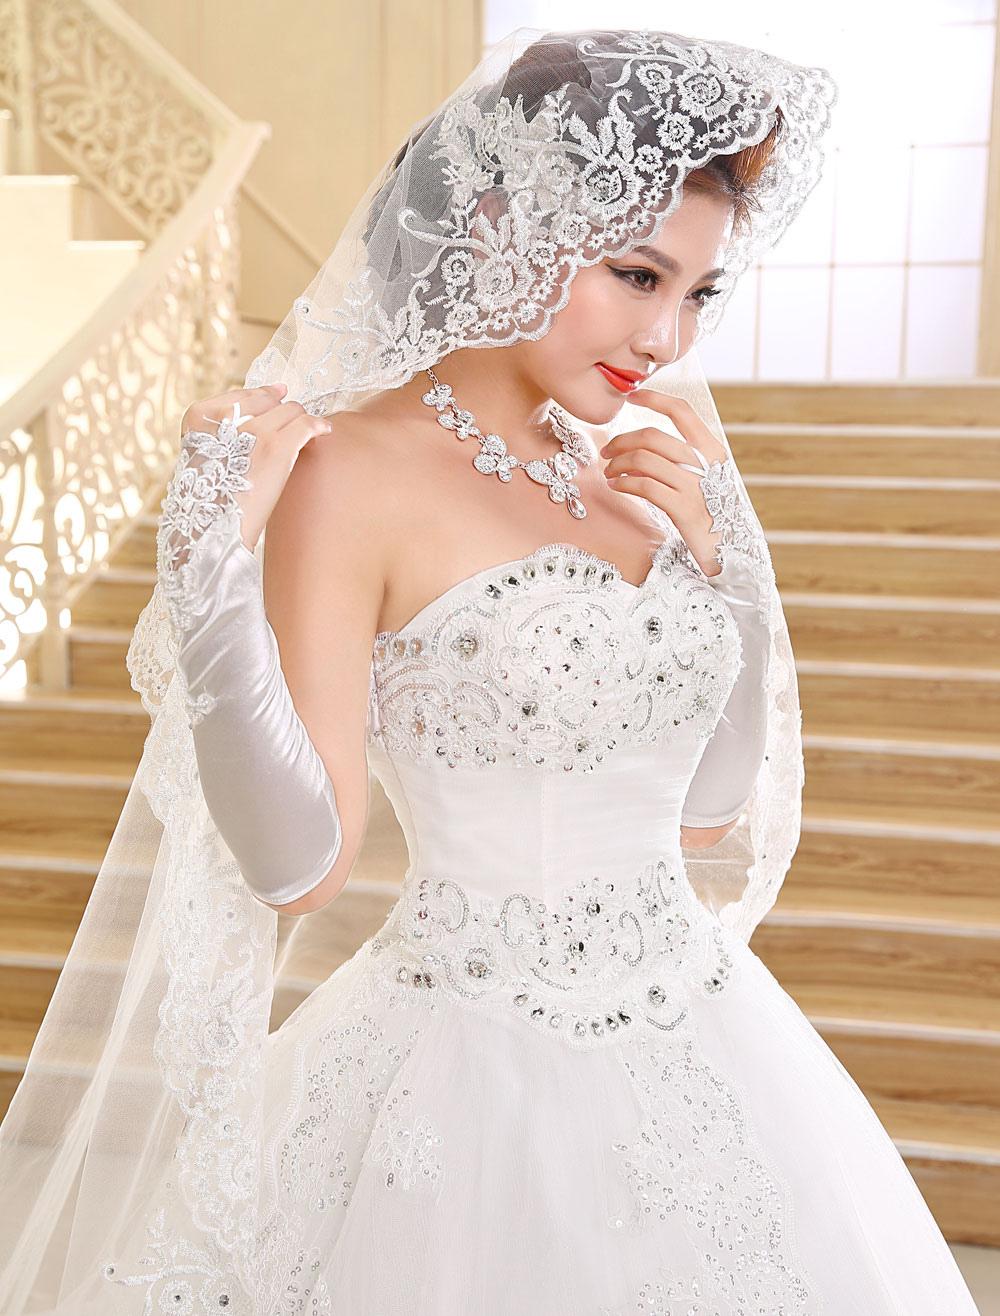 Princess Wedding Dresses Strapless Ball Gown Bridal Dress Lace ...